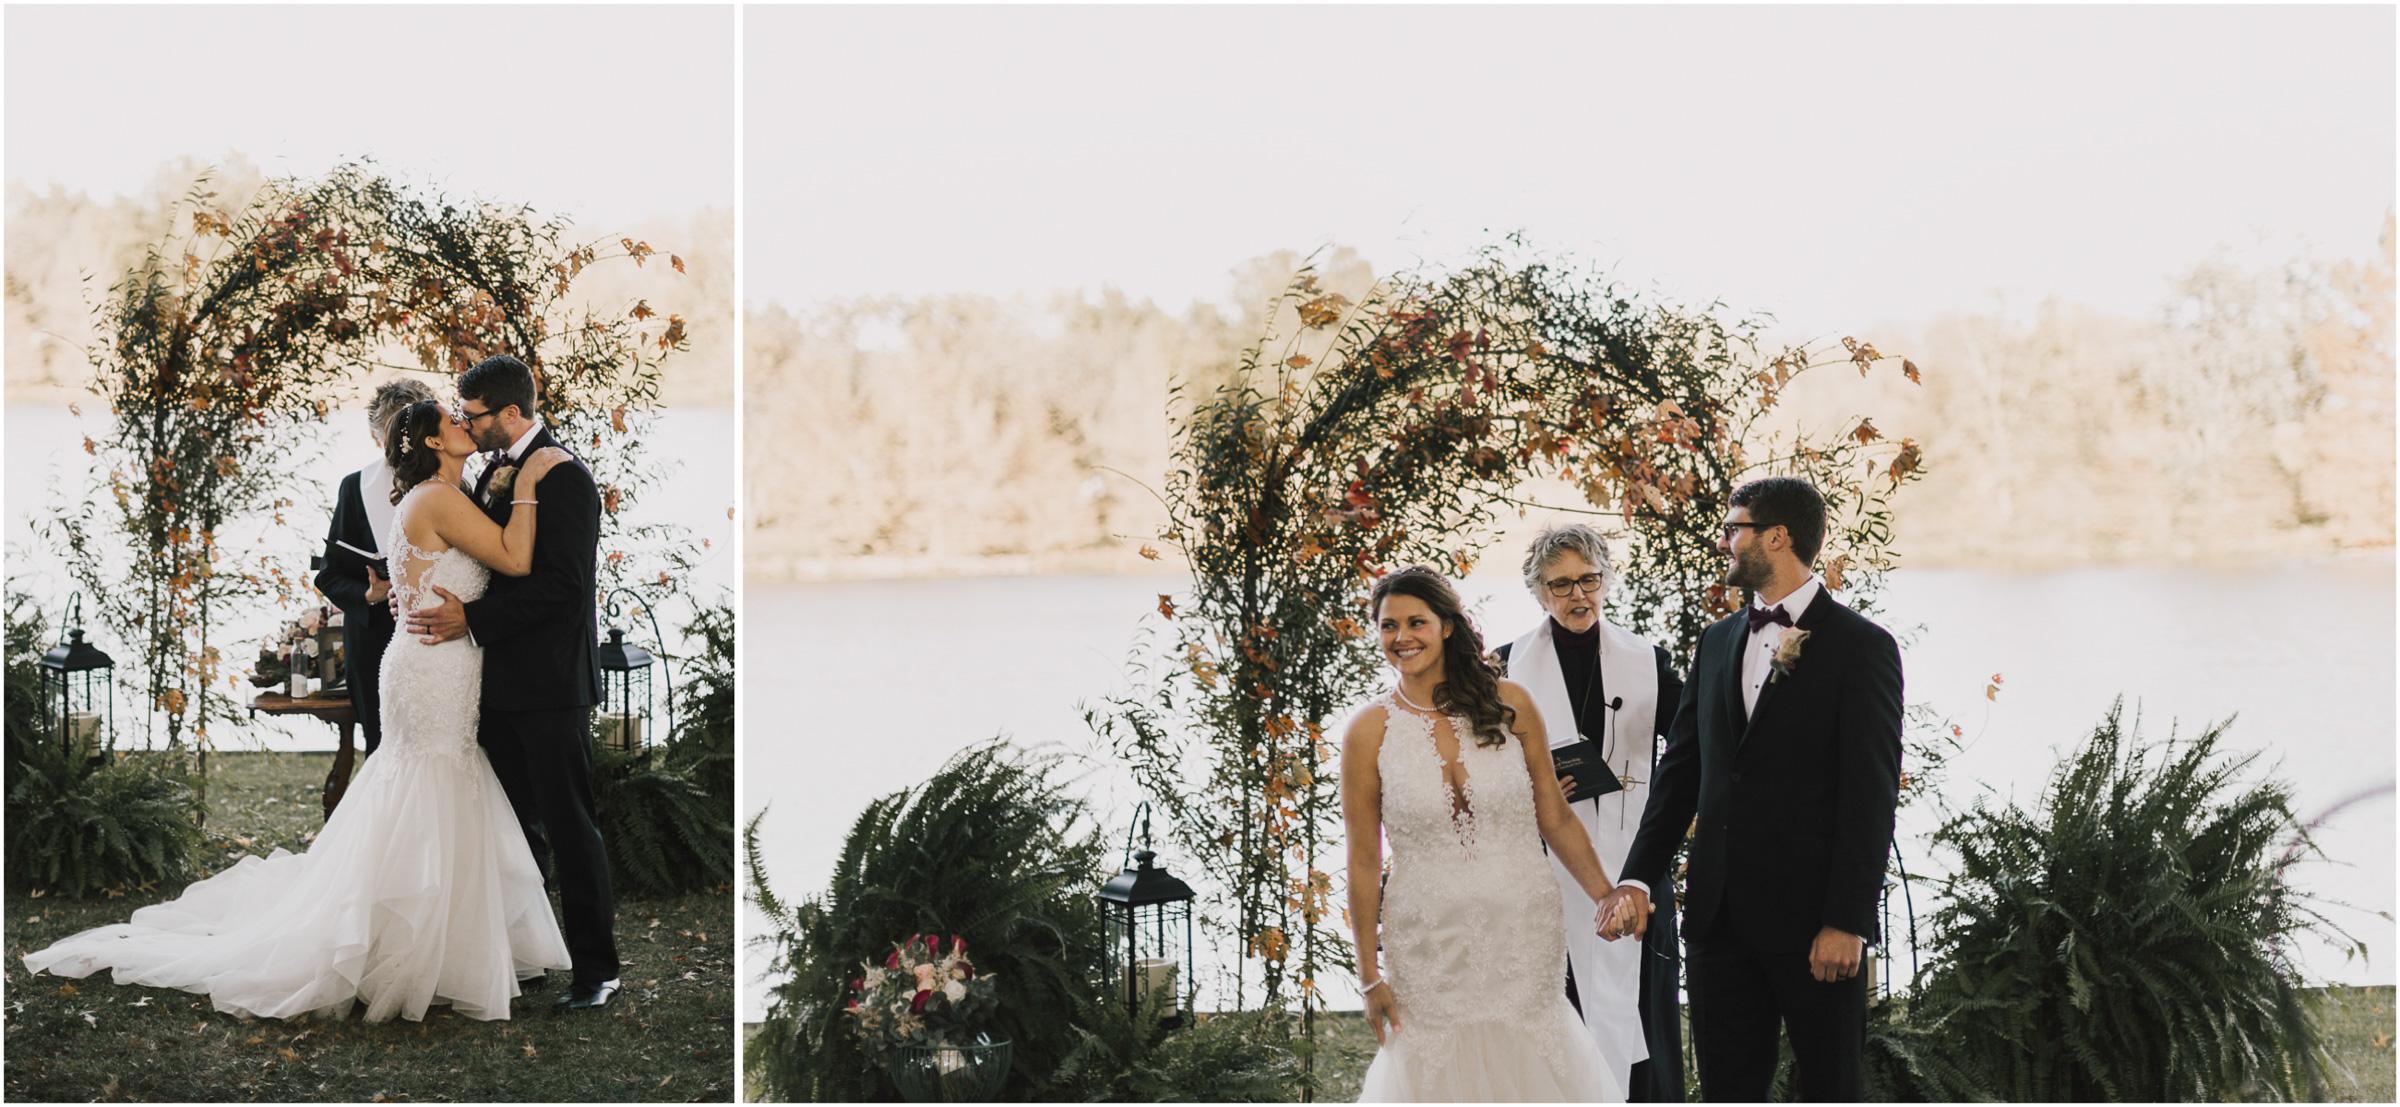 alyssa barletter photography intimate fall autumn wedding rural missouri wedding photographer-33.jpg